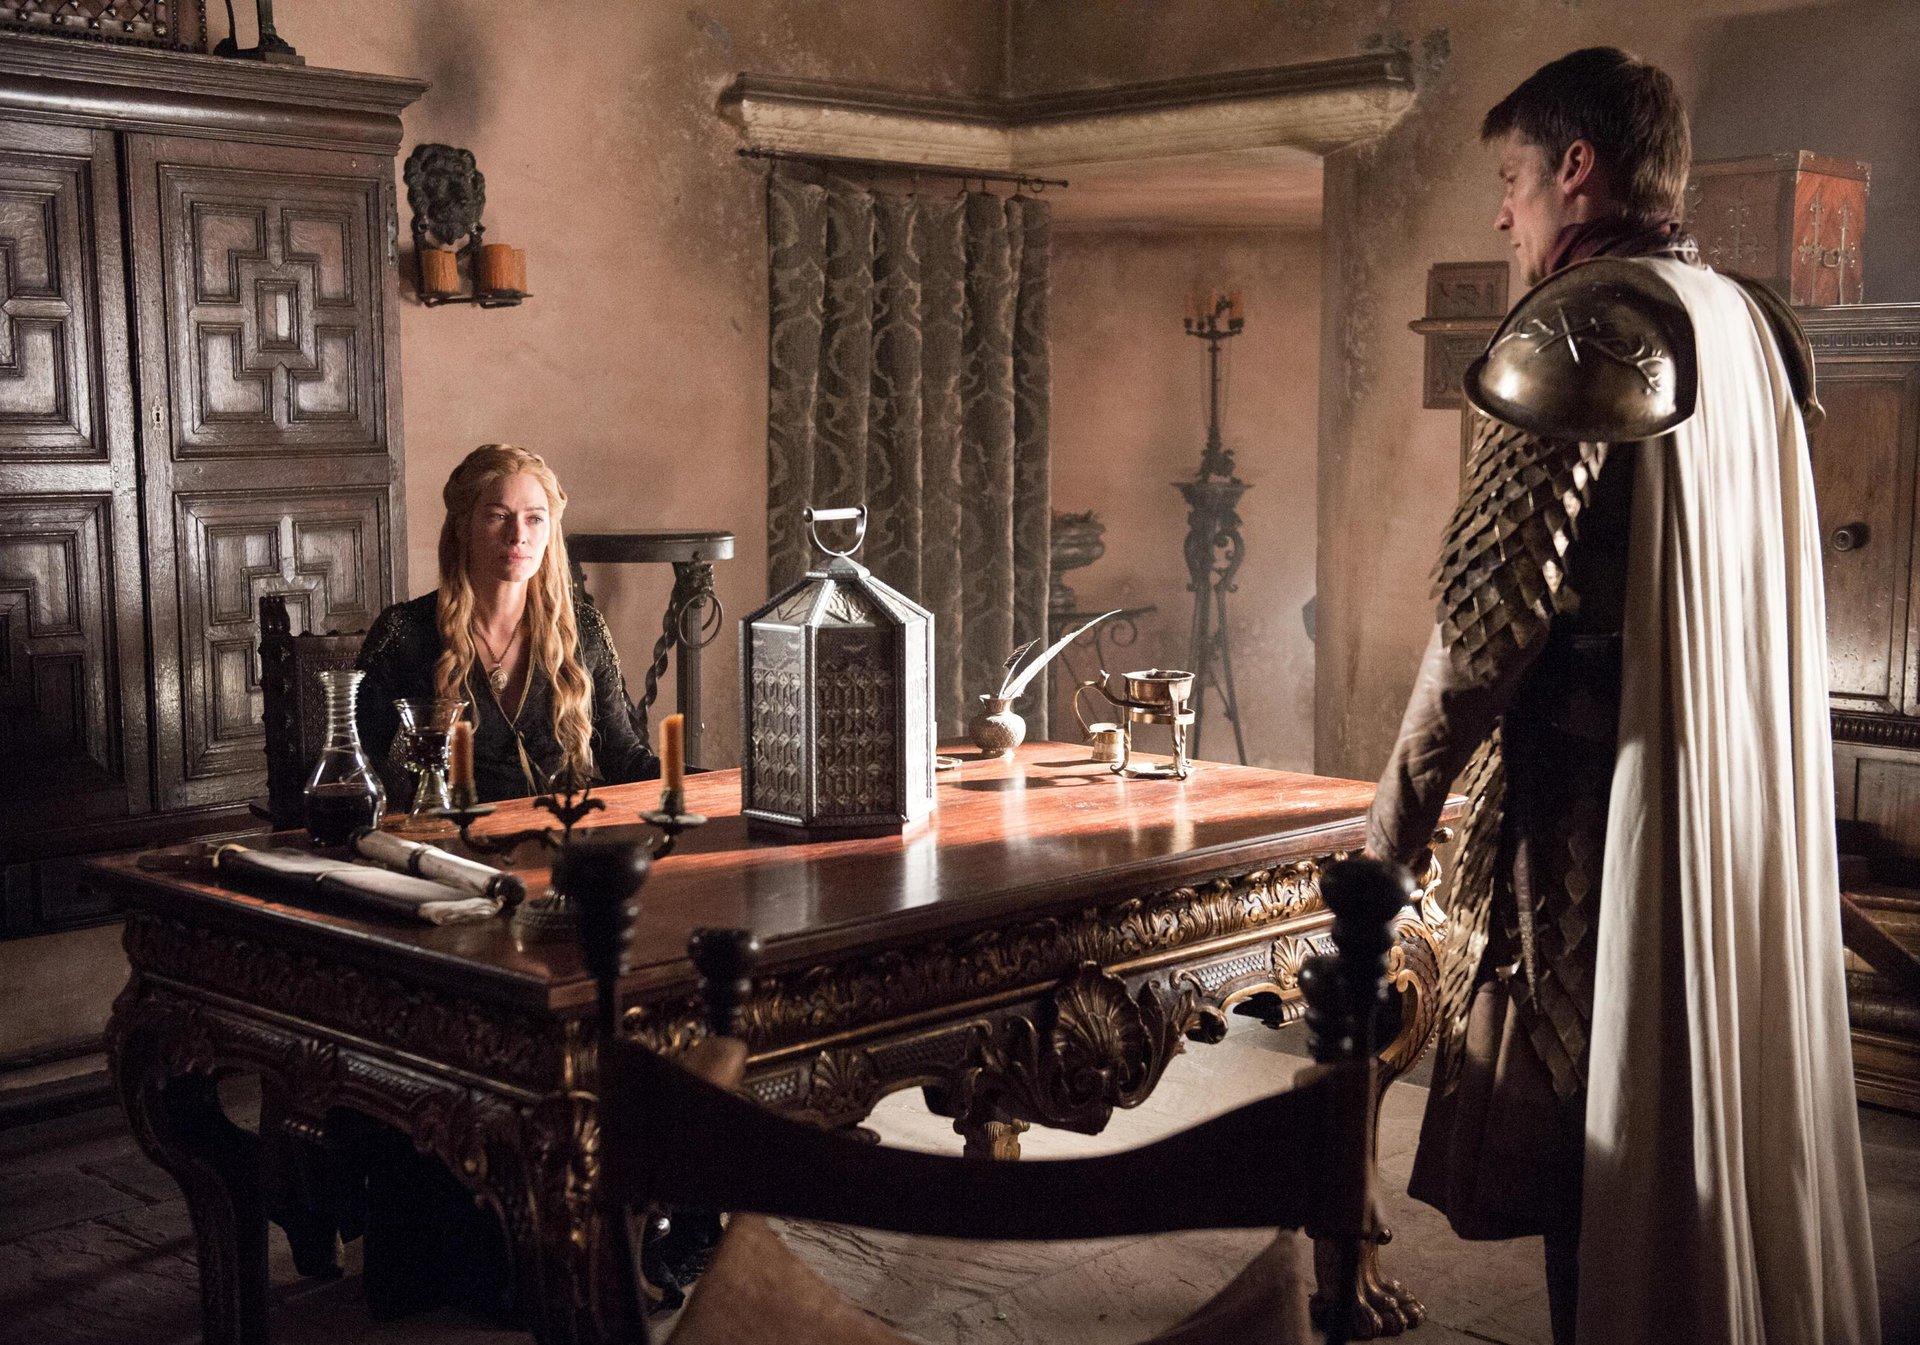 Emejing Game Of Thrones Interieur Ideen Images - Rellik.us - rellik.us